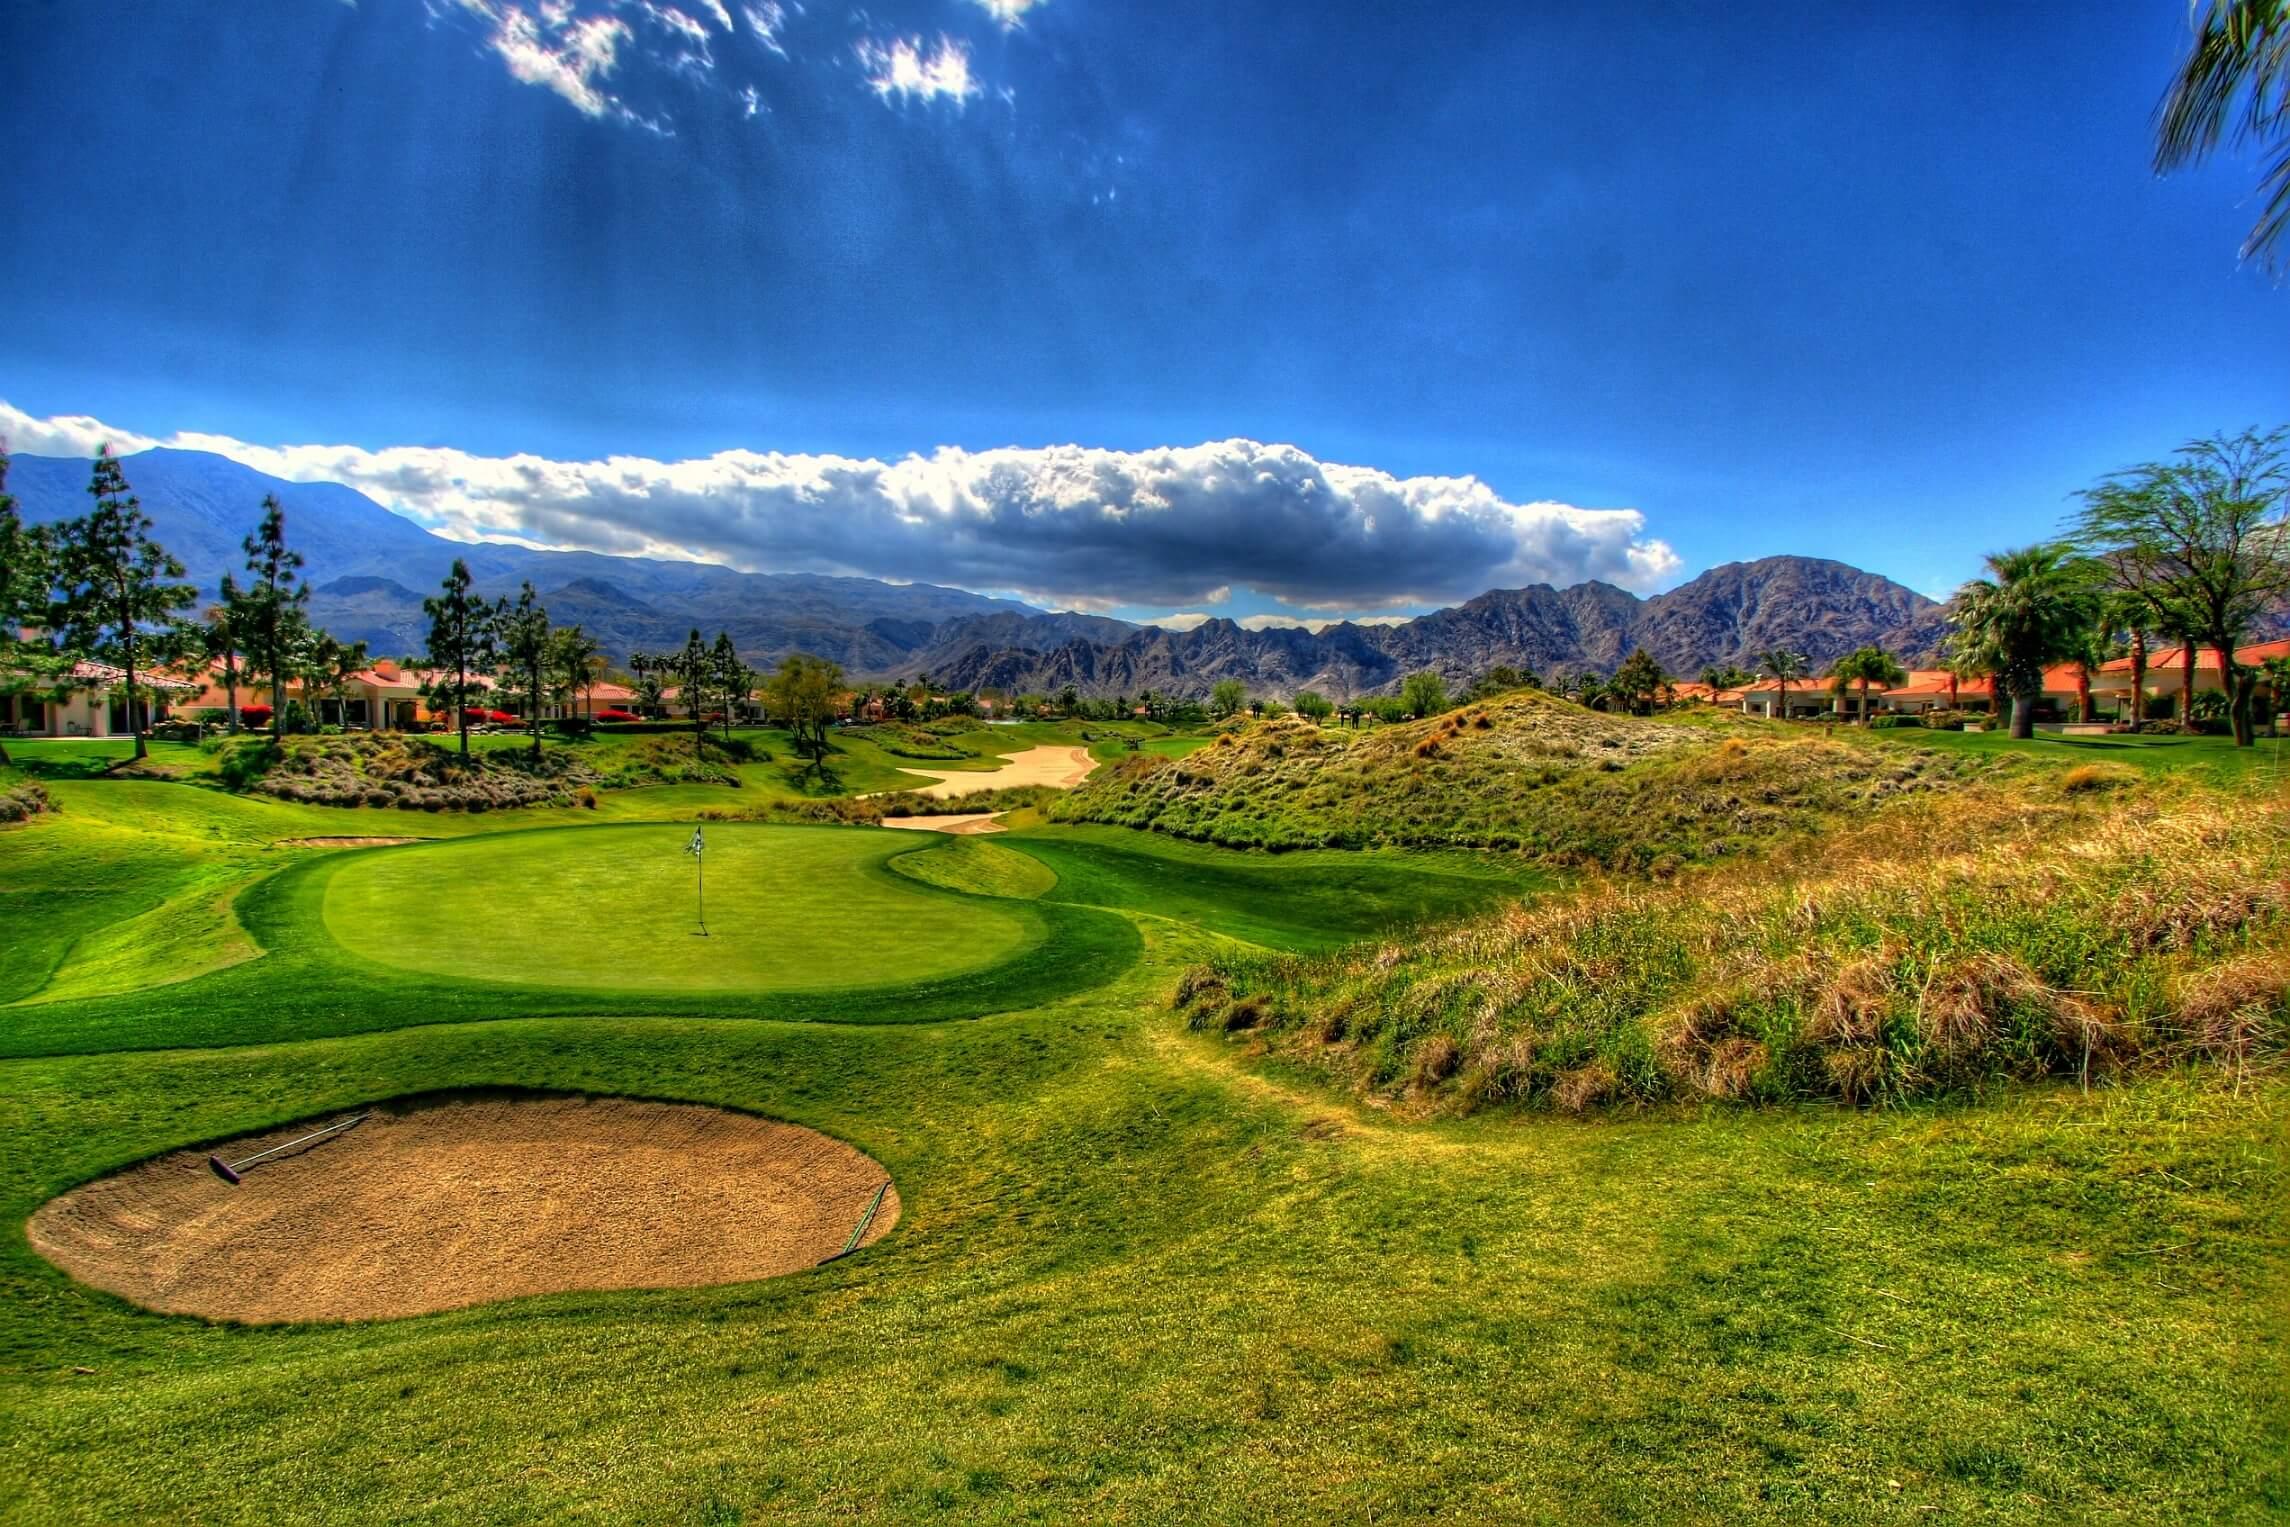 Sueno hotel atlantic golf holidays atlantic golf holidays - Sueno Hotel Atlantic Golf Holidays Atlantic Golf Holidays Sueno Hotel Atlantic Golf Holidays Atlantic Golf